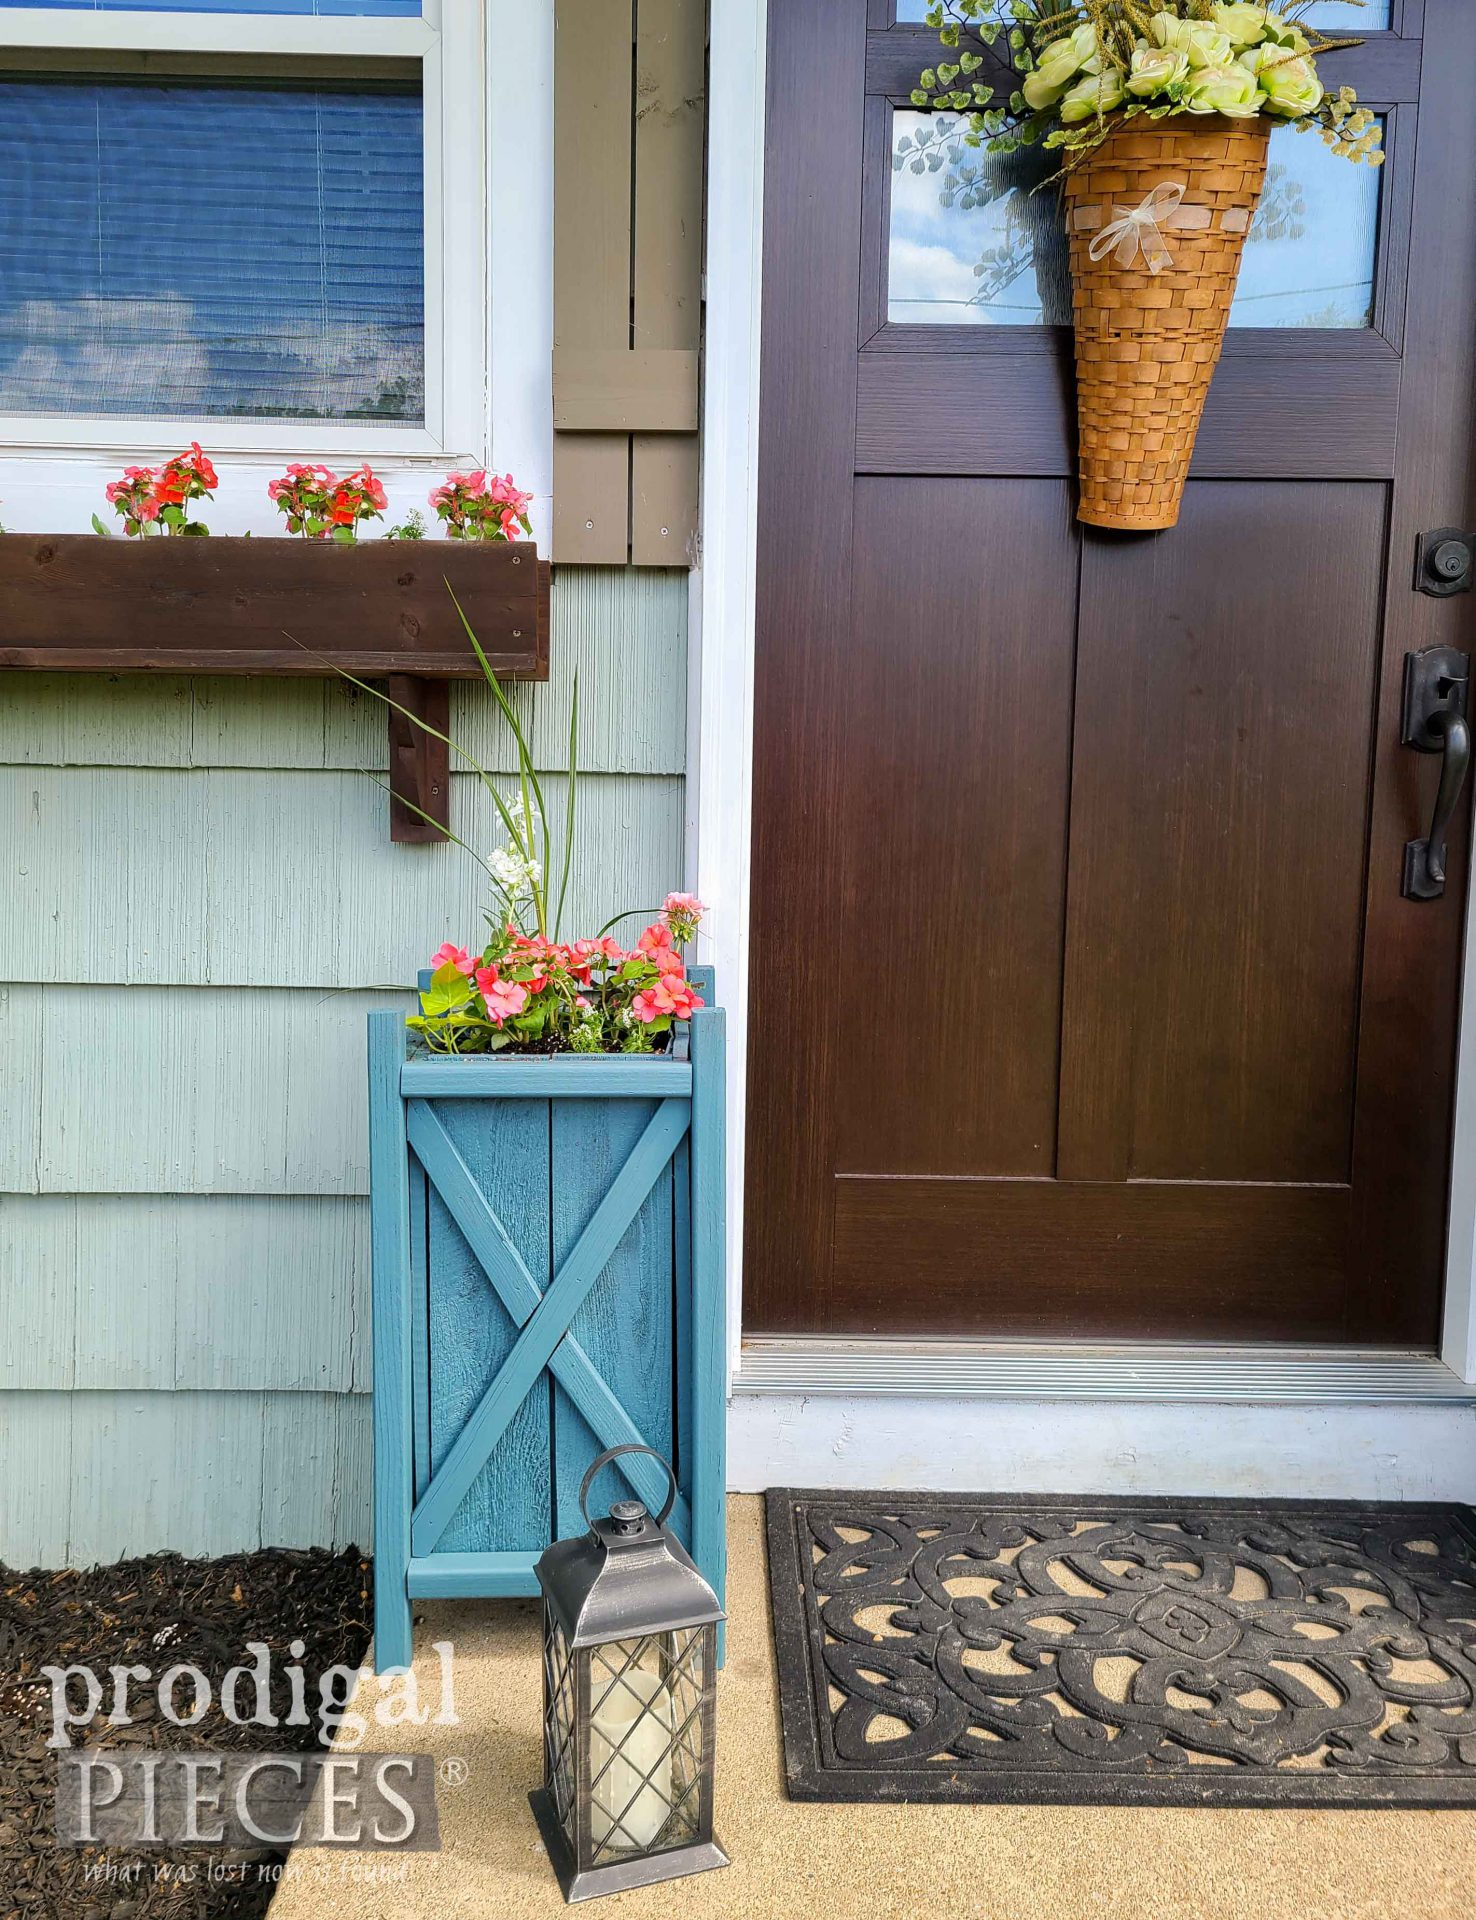 Farmhouse Blue Planter with Free Build Plans by Larissa of Prodigal Pieces | prodigalpieces.com #prodigalpieces #farmhouse #home #garden